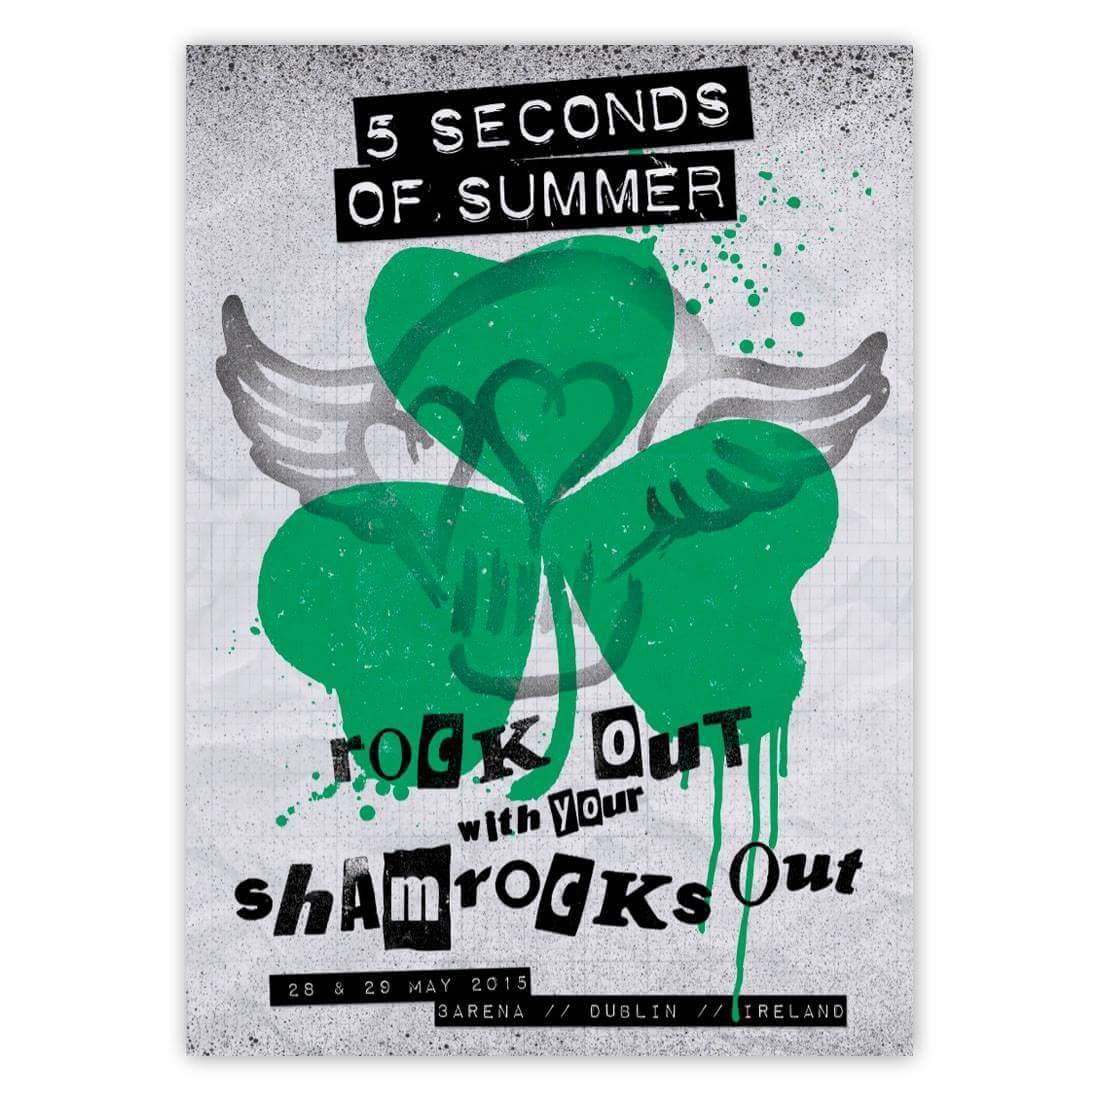 5sos poster design - 5 Seconds Of Summer On Twitter Dublin 28 05 2015 29 05 2015 Http T Co Zzqxwjiol0